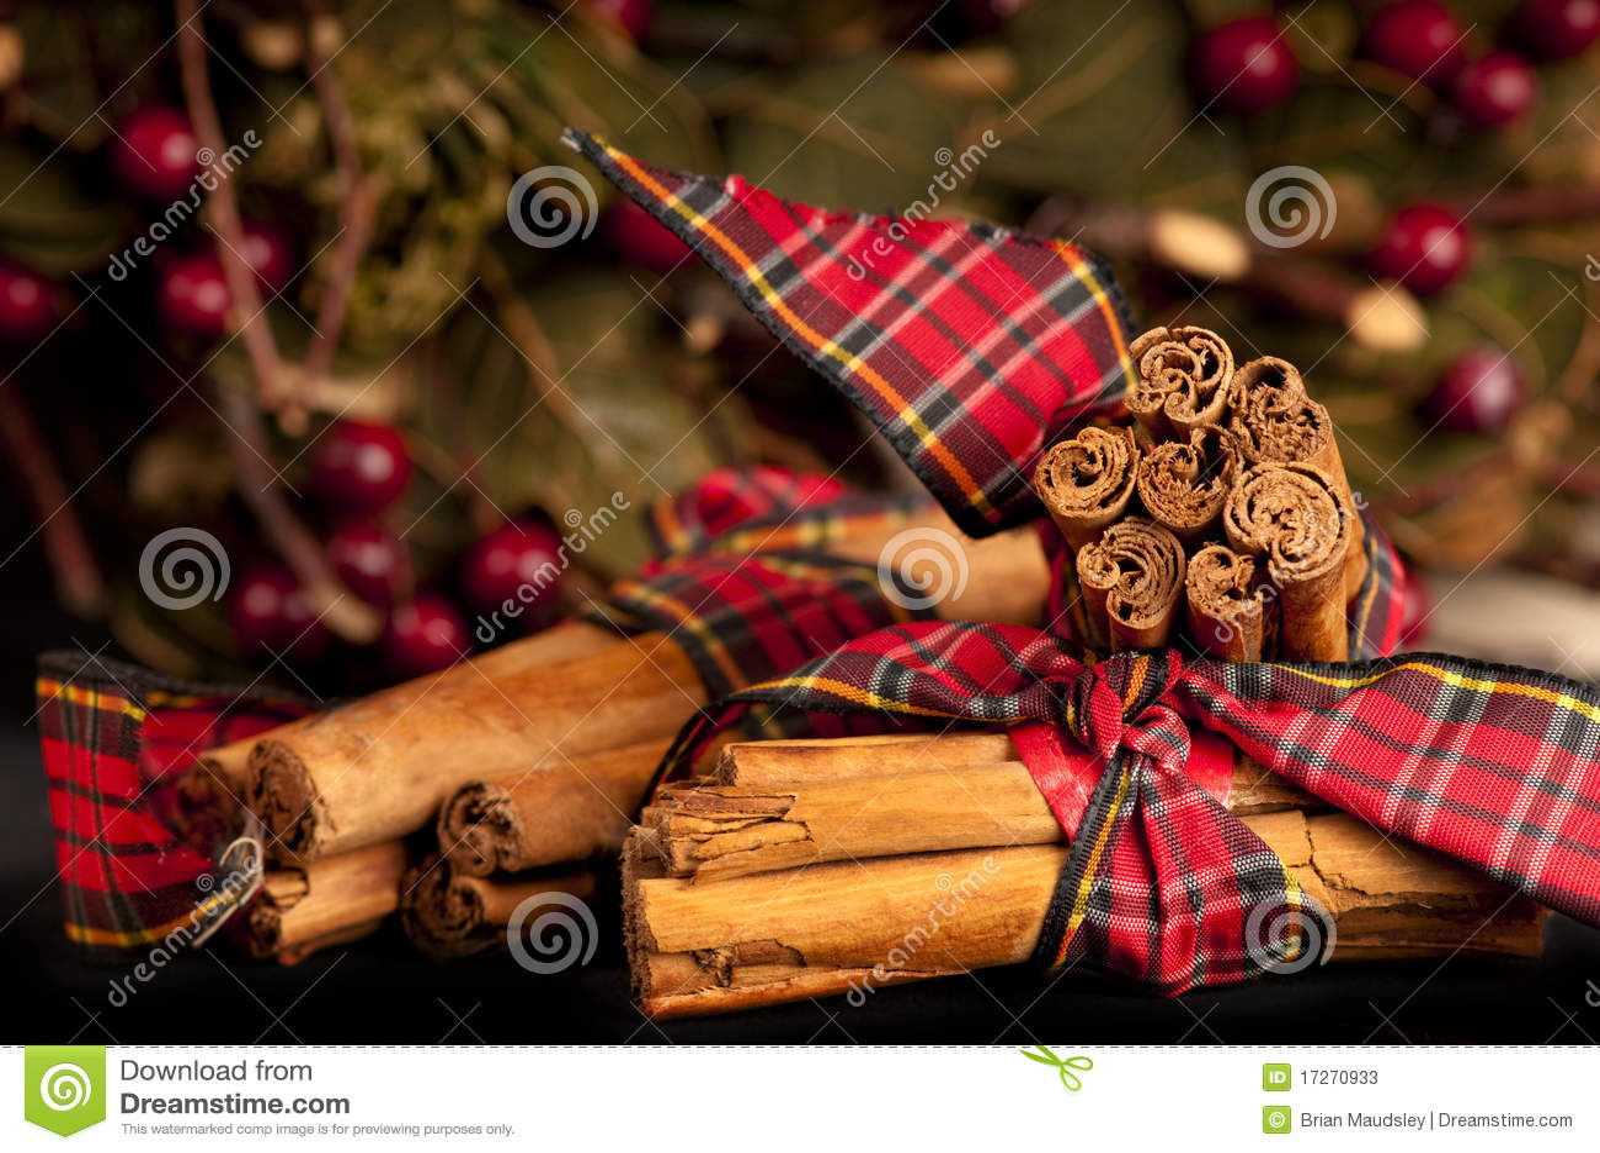 Decorated Cinnamon sticks for Christmas.